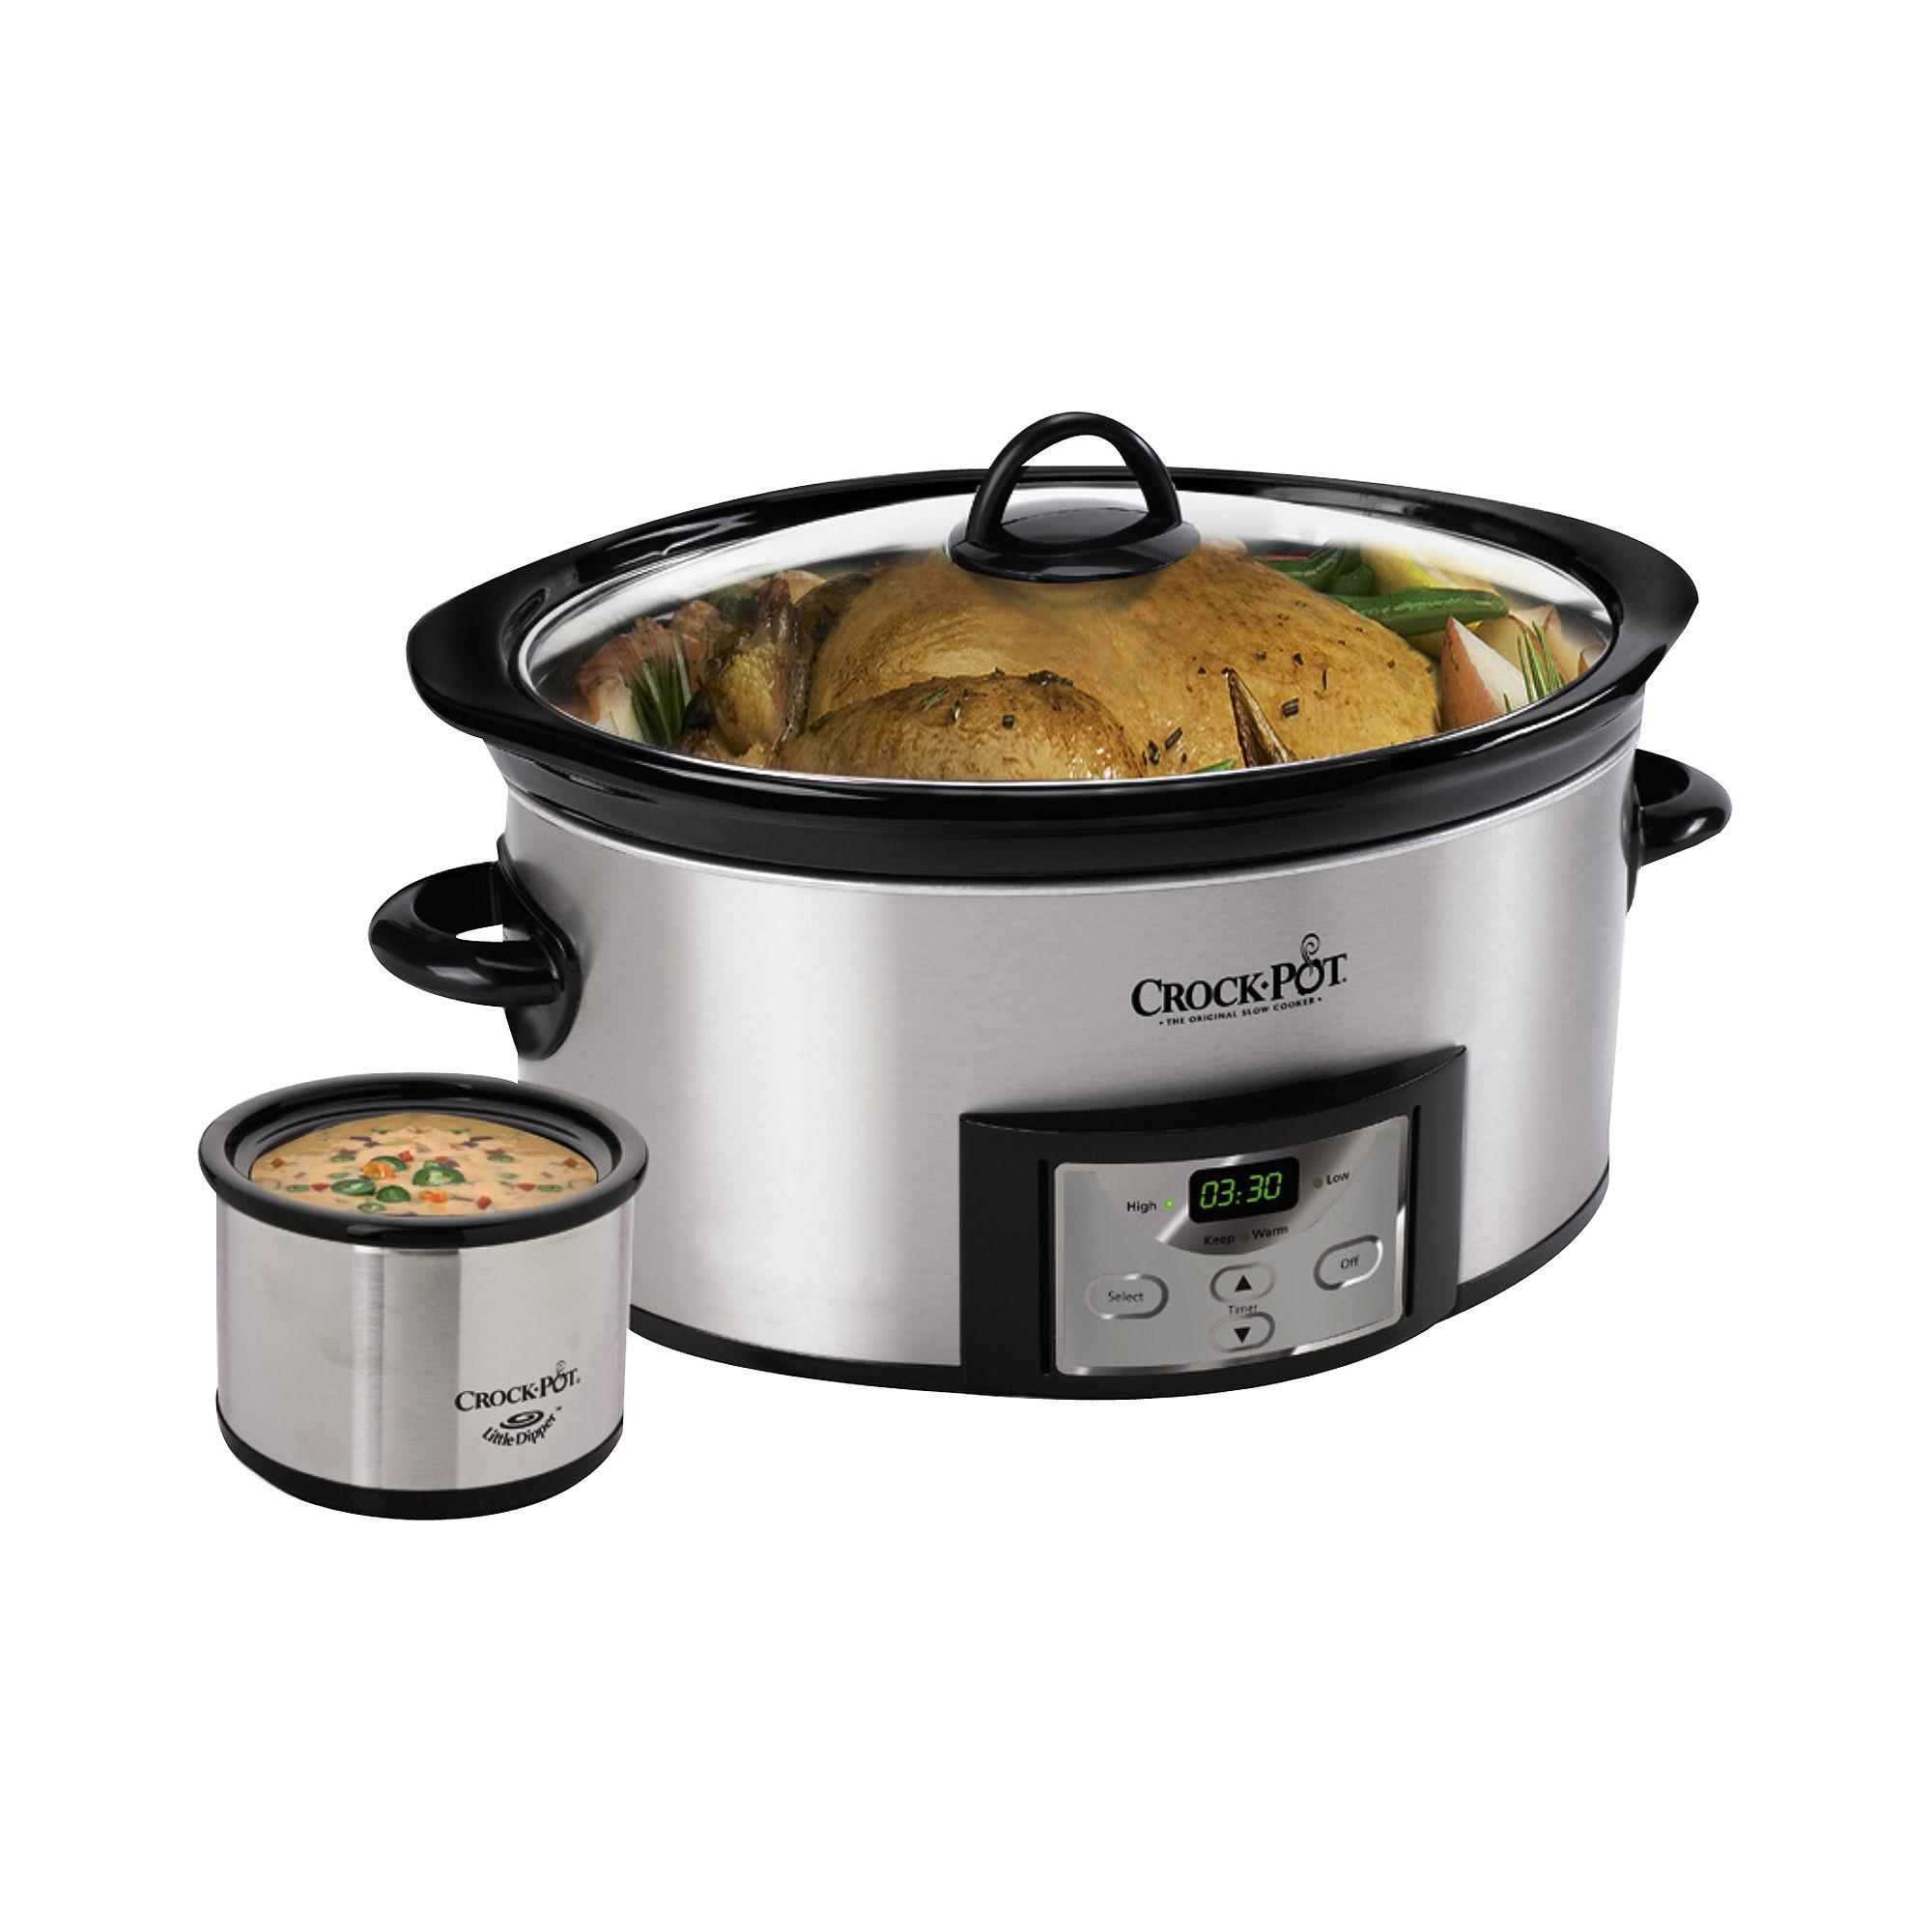 "Crock-Pot 6-Qt. Slow Cooker & Little Dipper"""